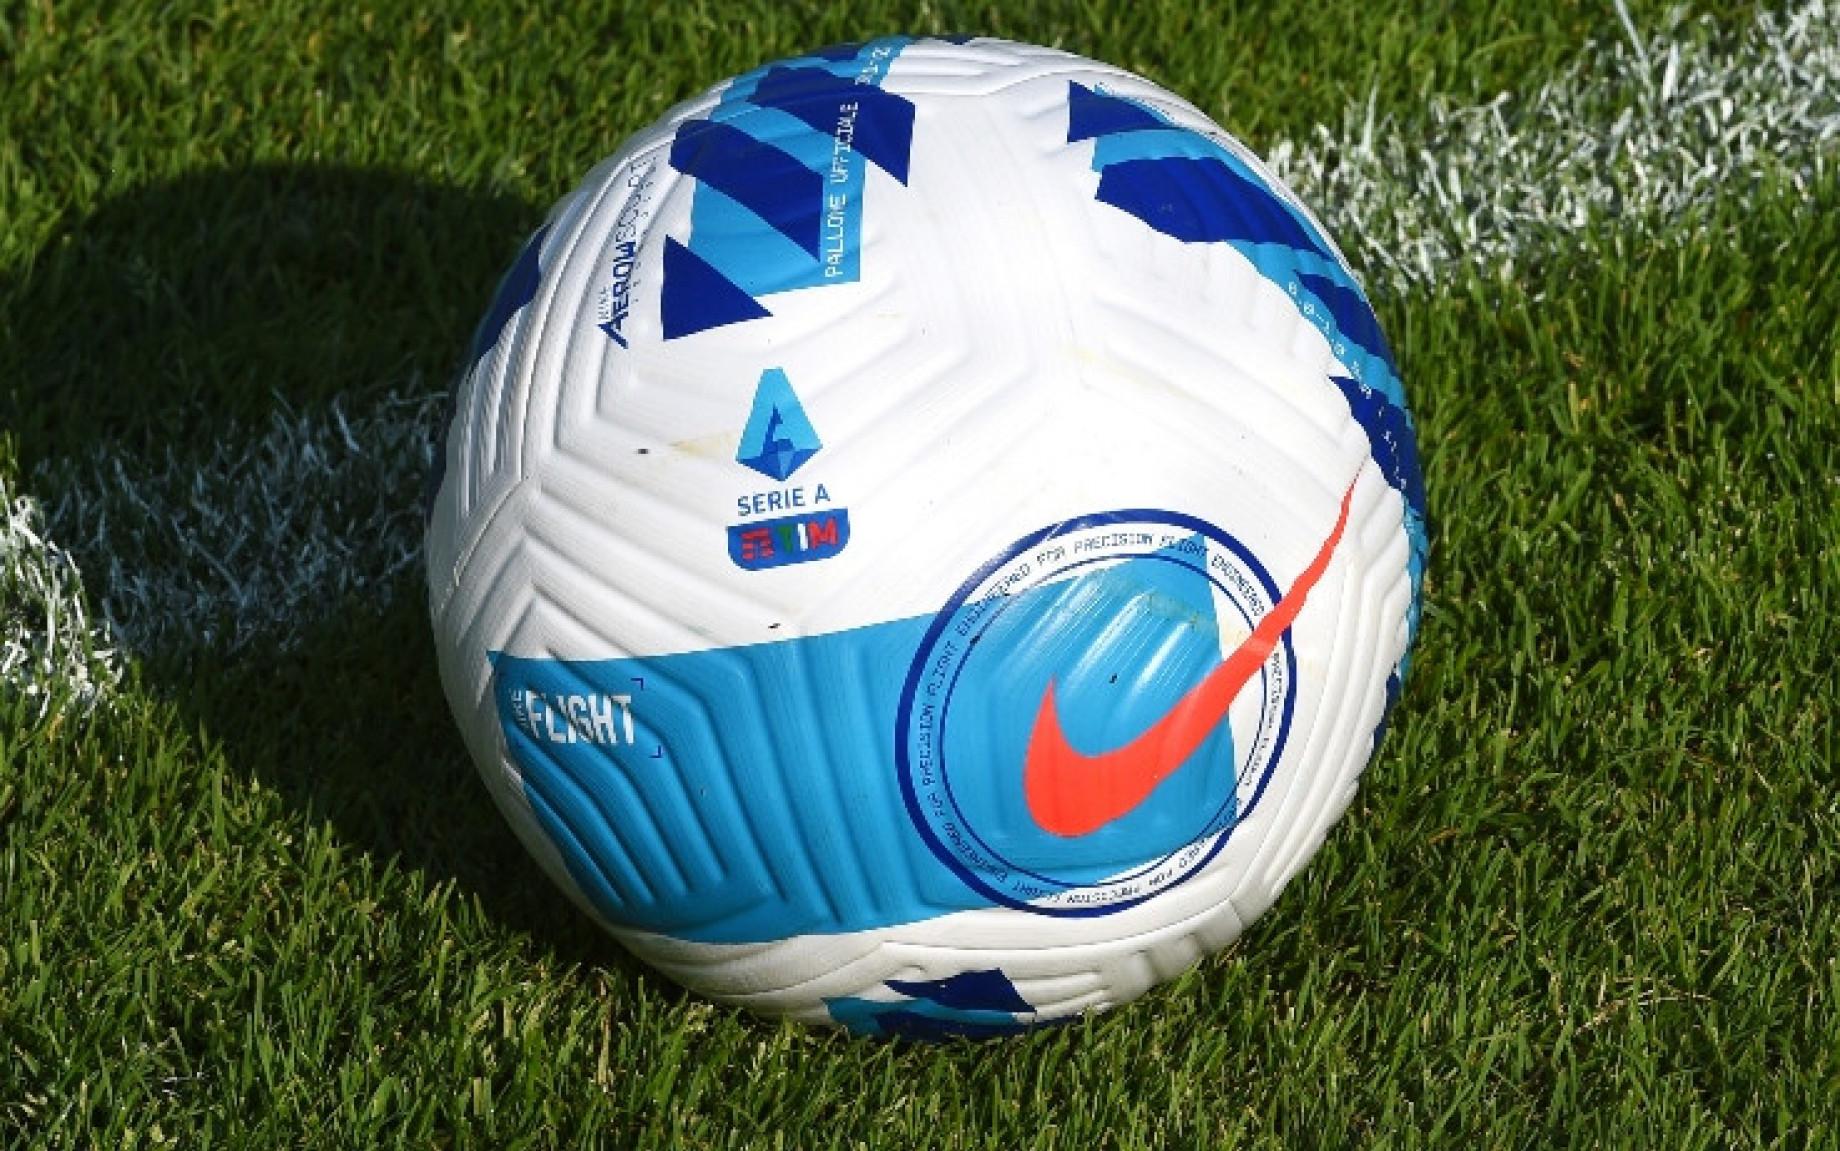 pallone-serie-a-image.jpg